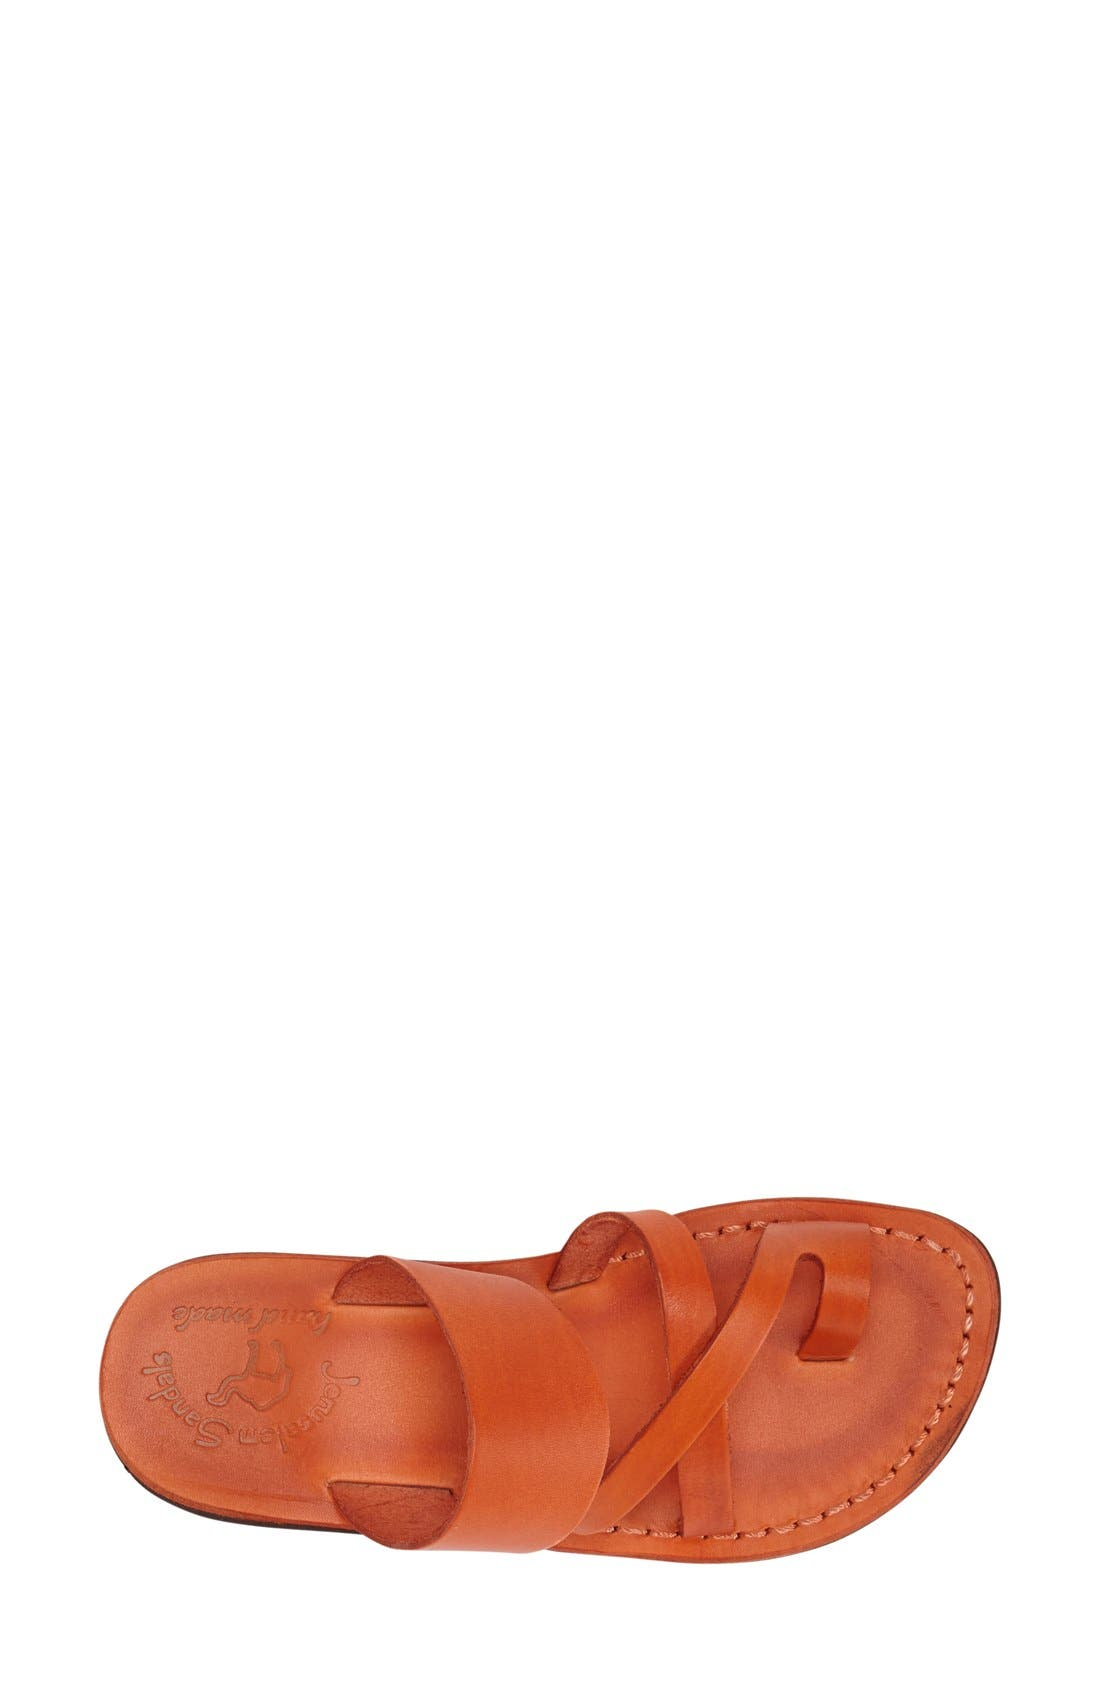 'The Good Shepard' Leather Sandal,                             Alternate thumbnail 24, color,